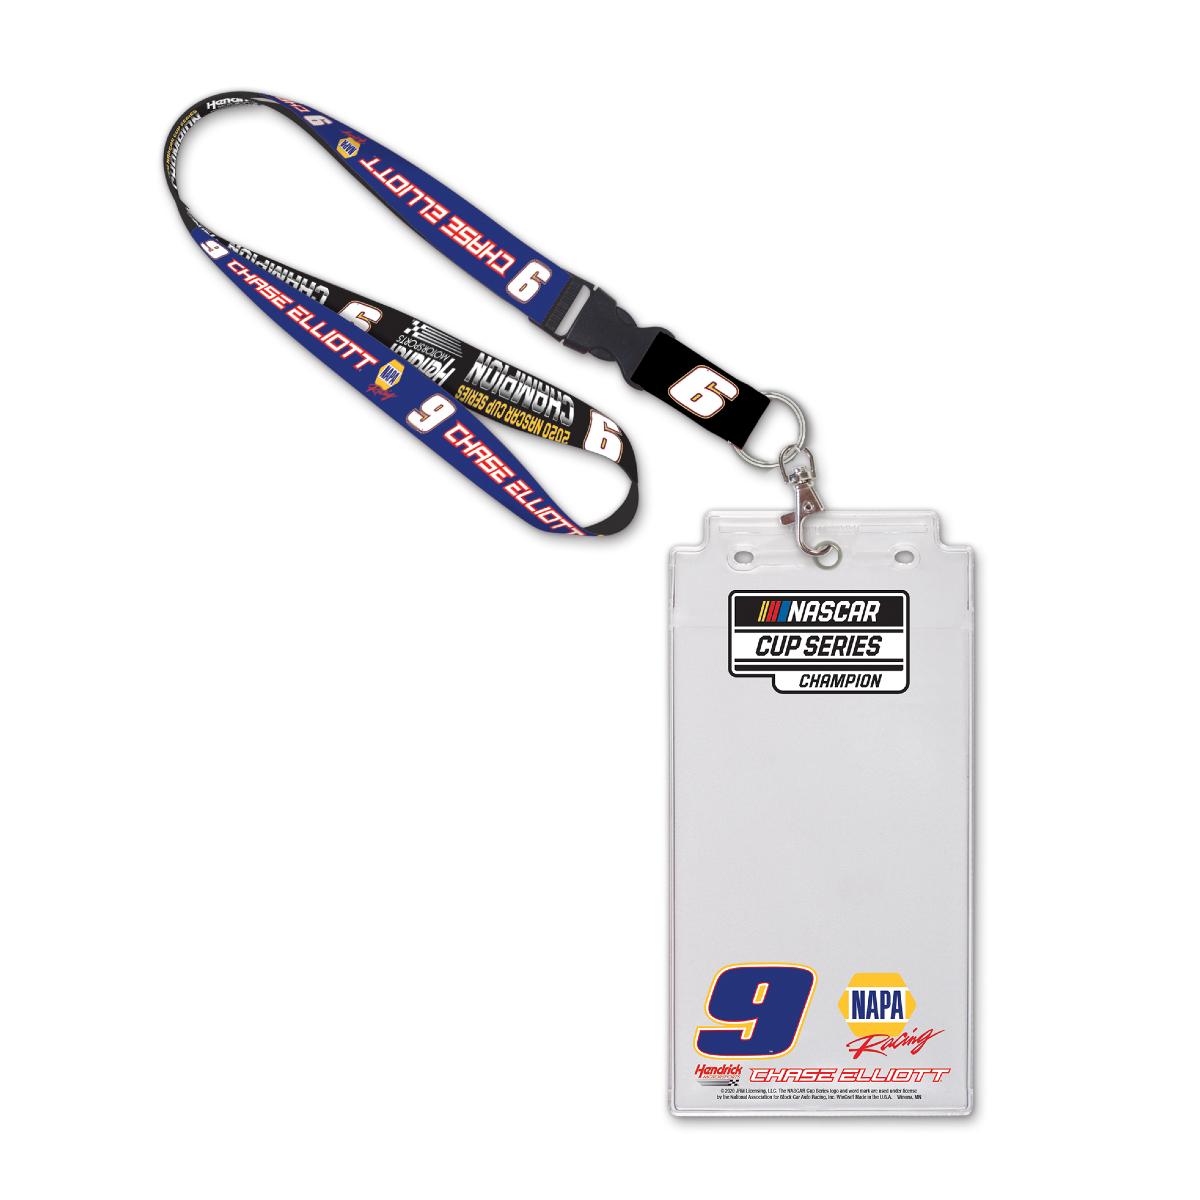 NASCAR 2020 Champion Lanyard & Credential Holder